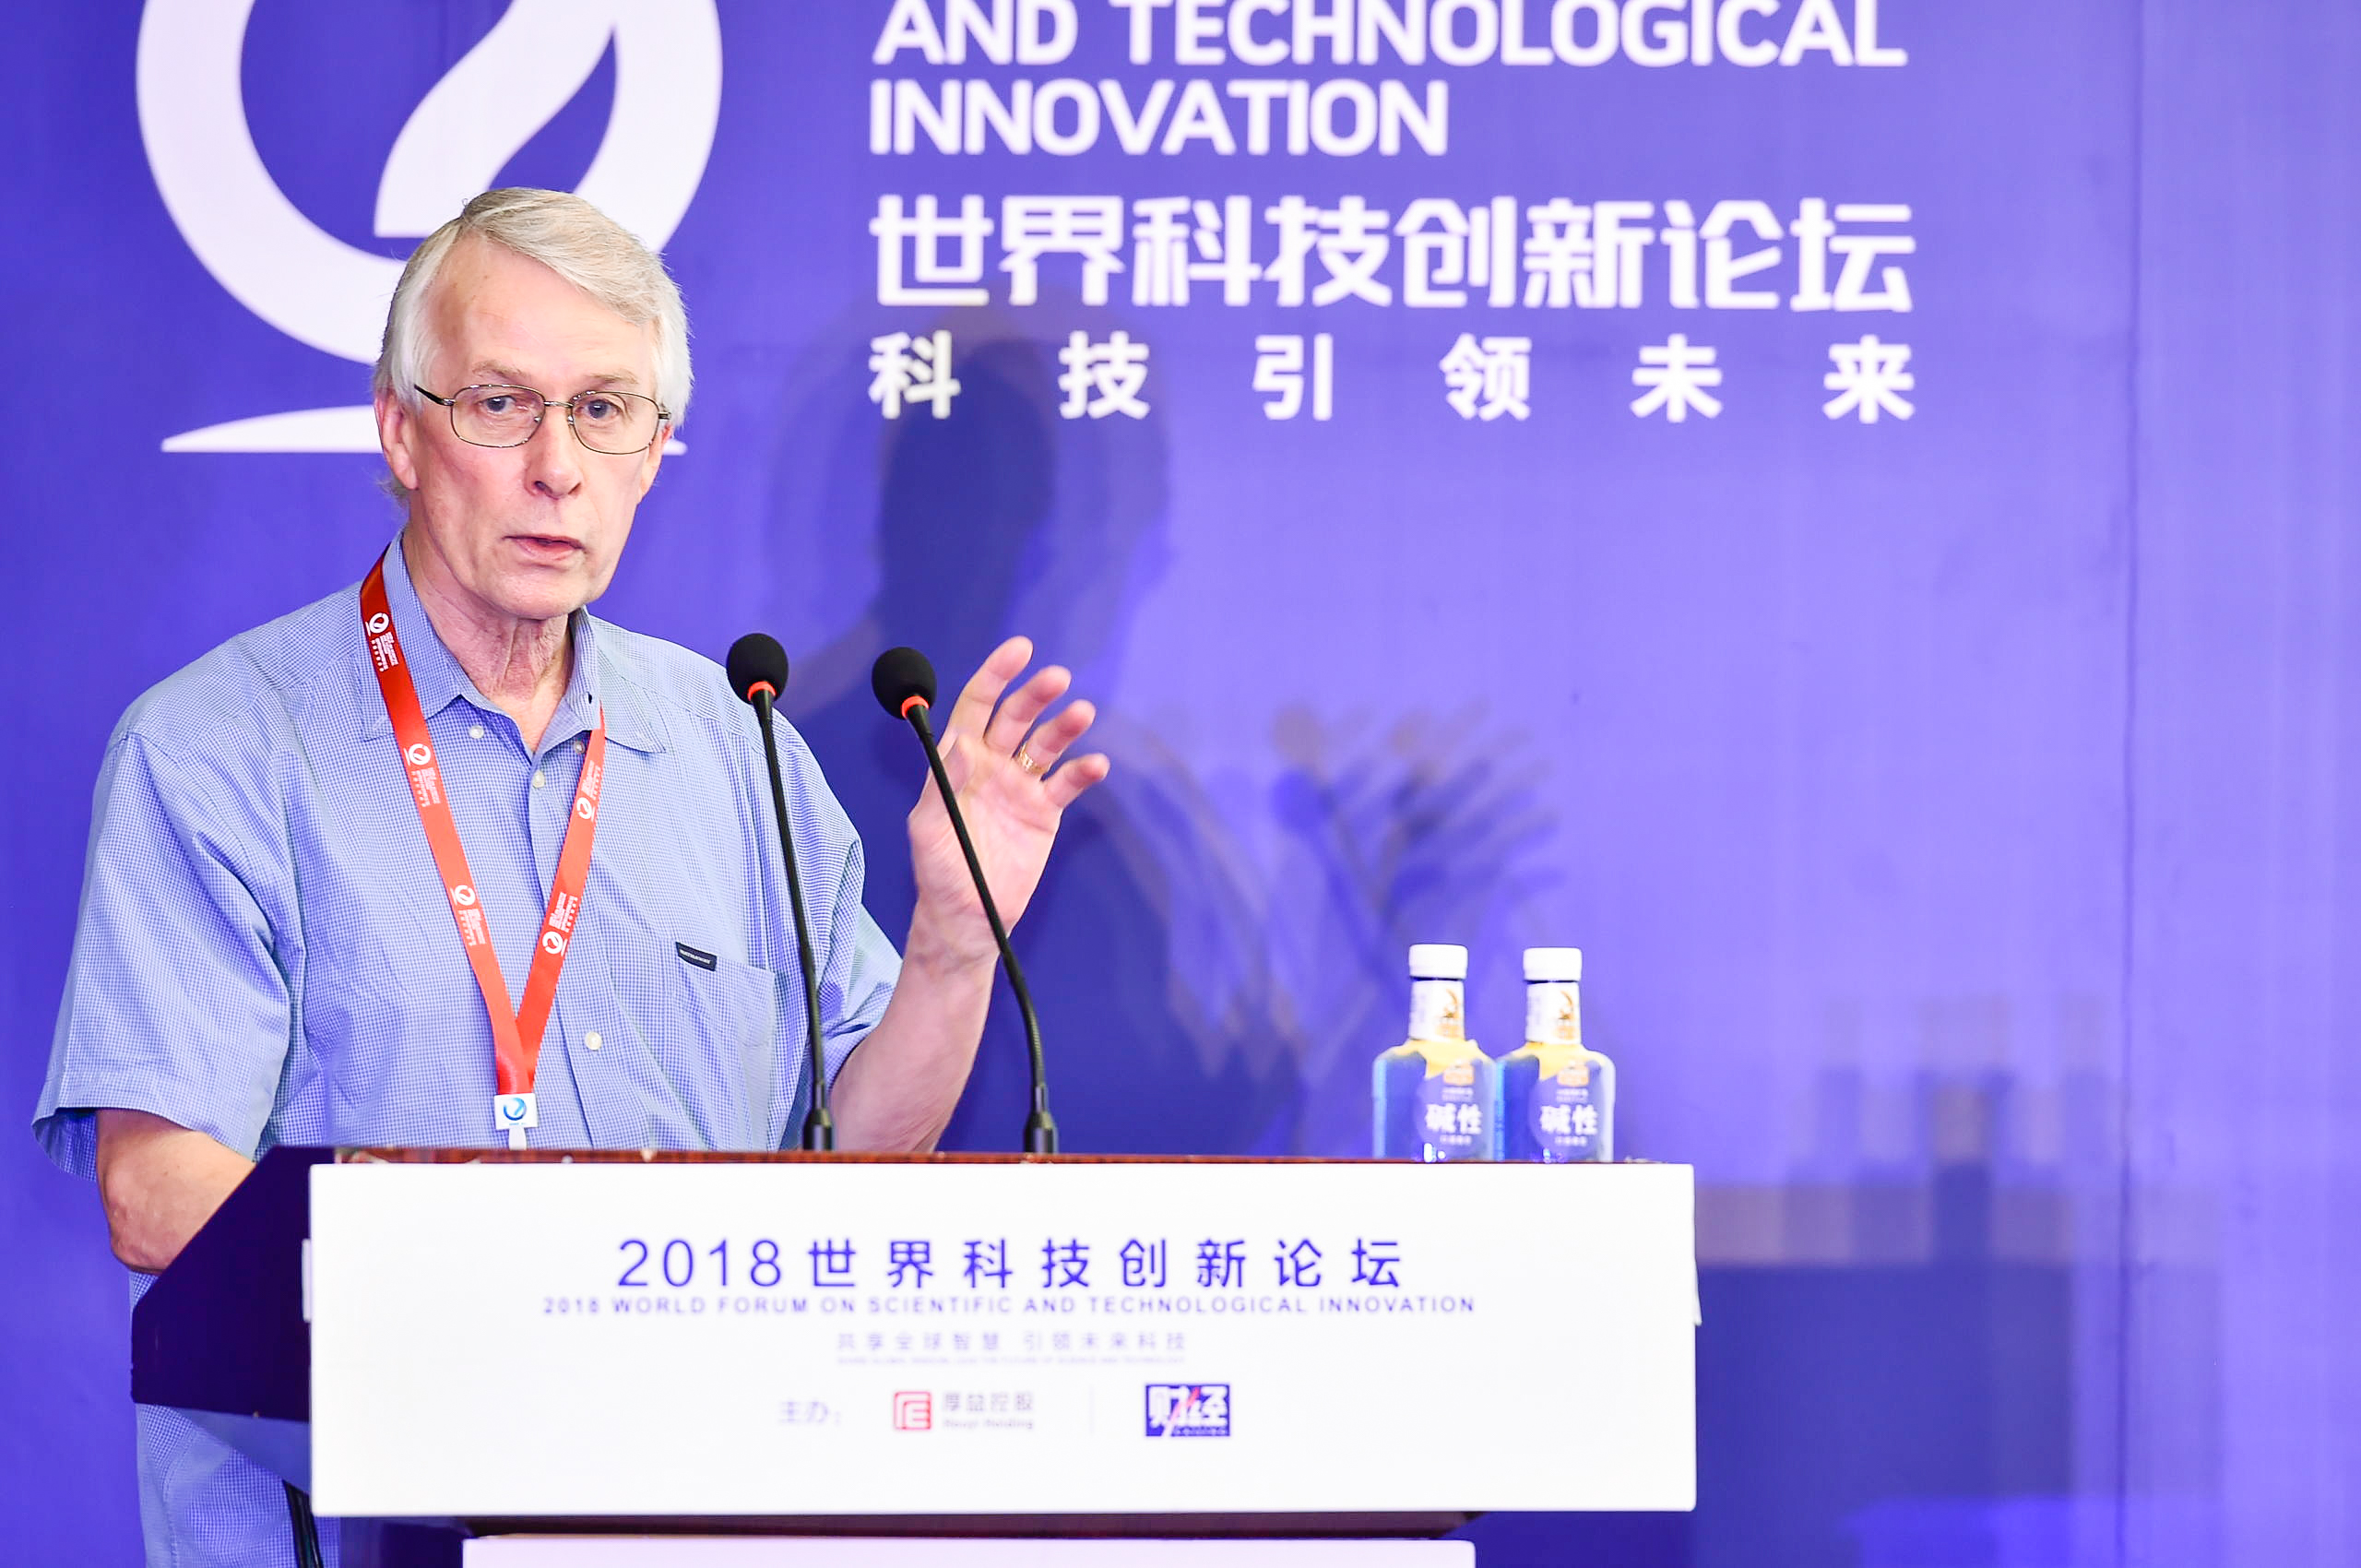 Richard J.Roberts,1993年诺贝尔生理学或医学奖获得者